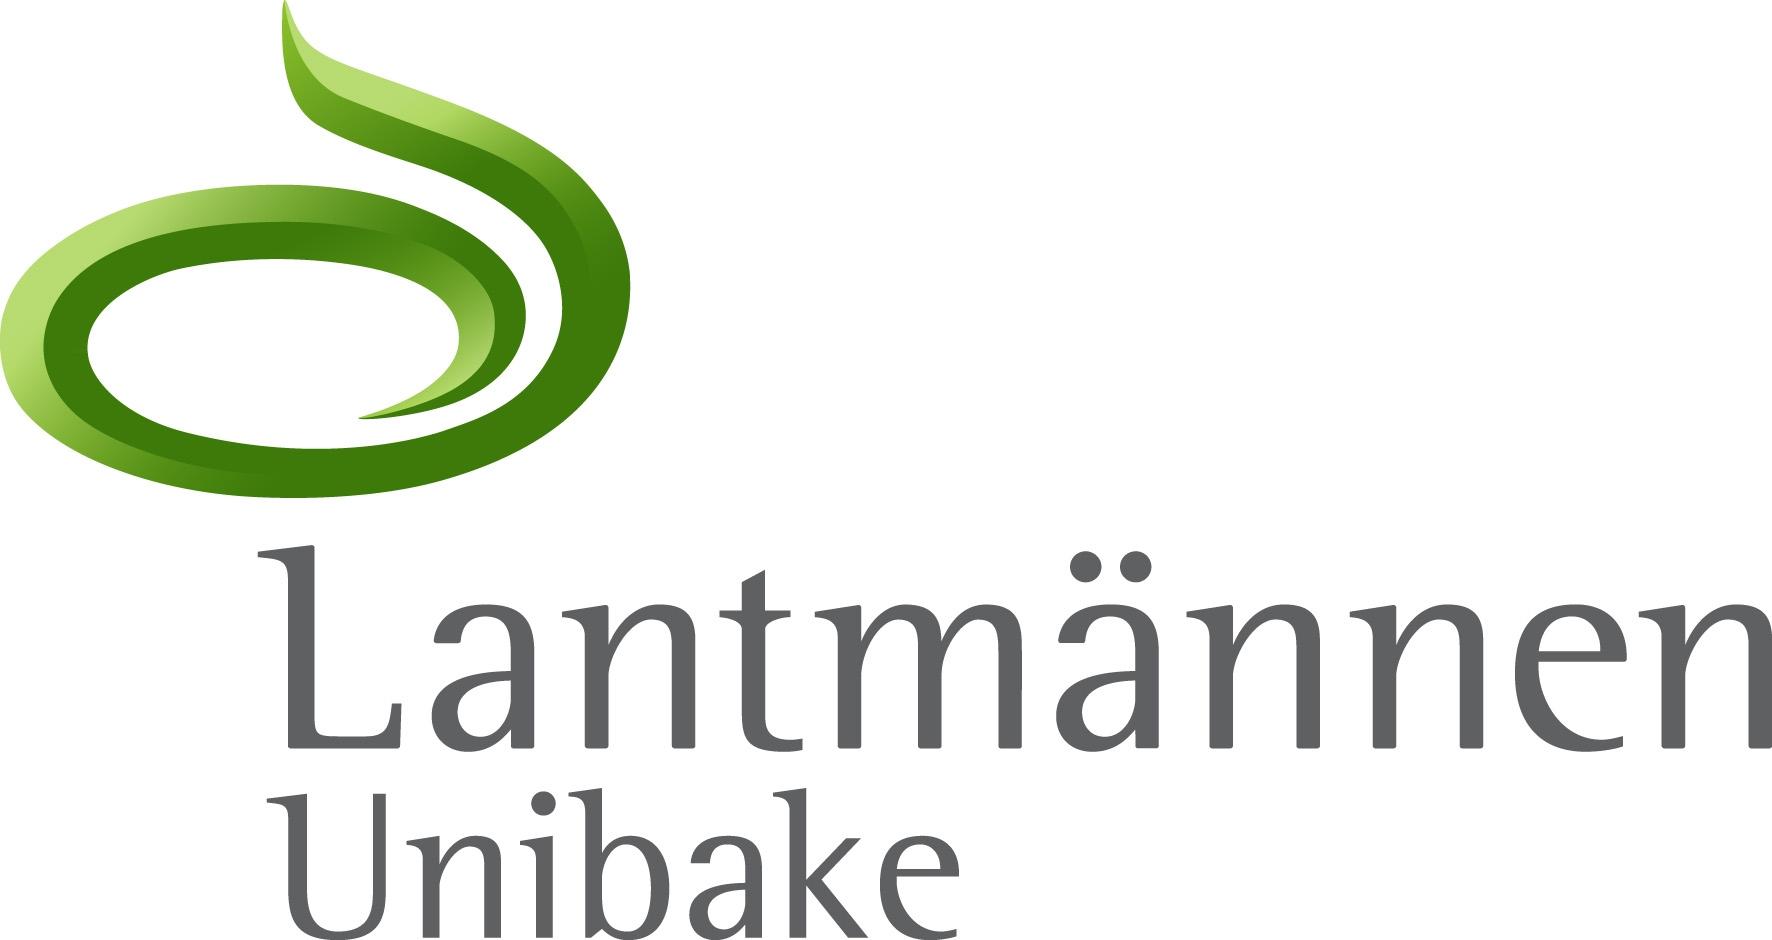 Unibake Bitmap high resolution (300dpi - JPEG).jpg